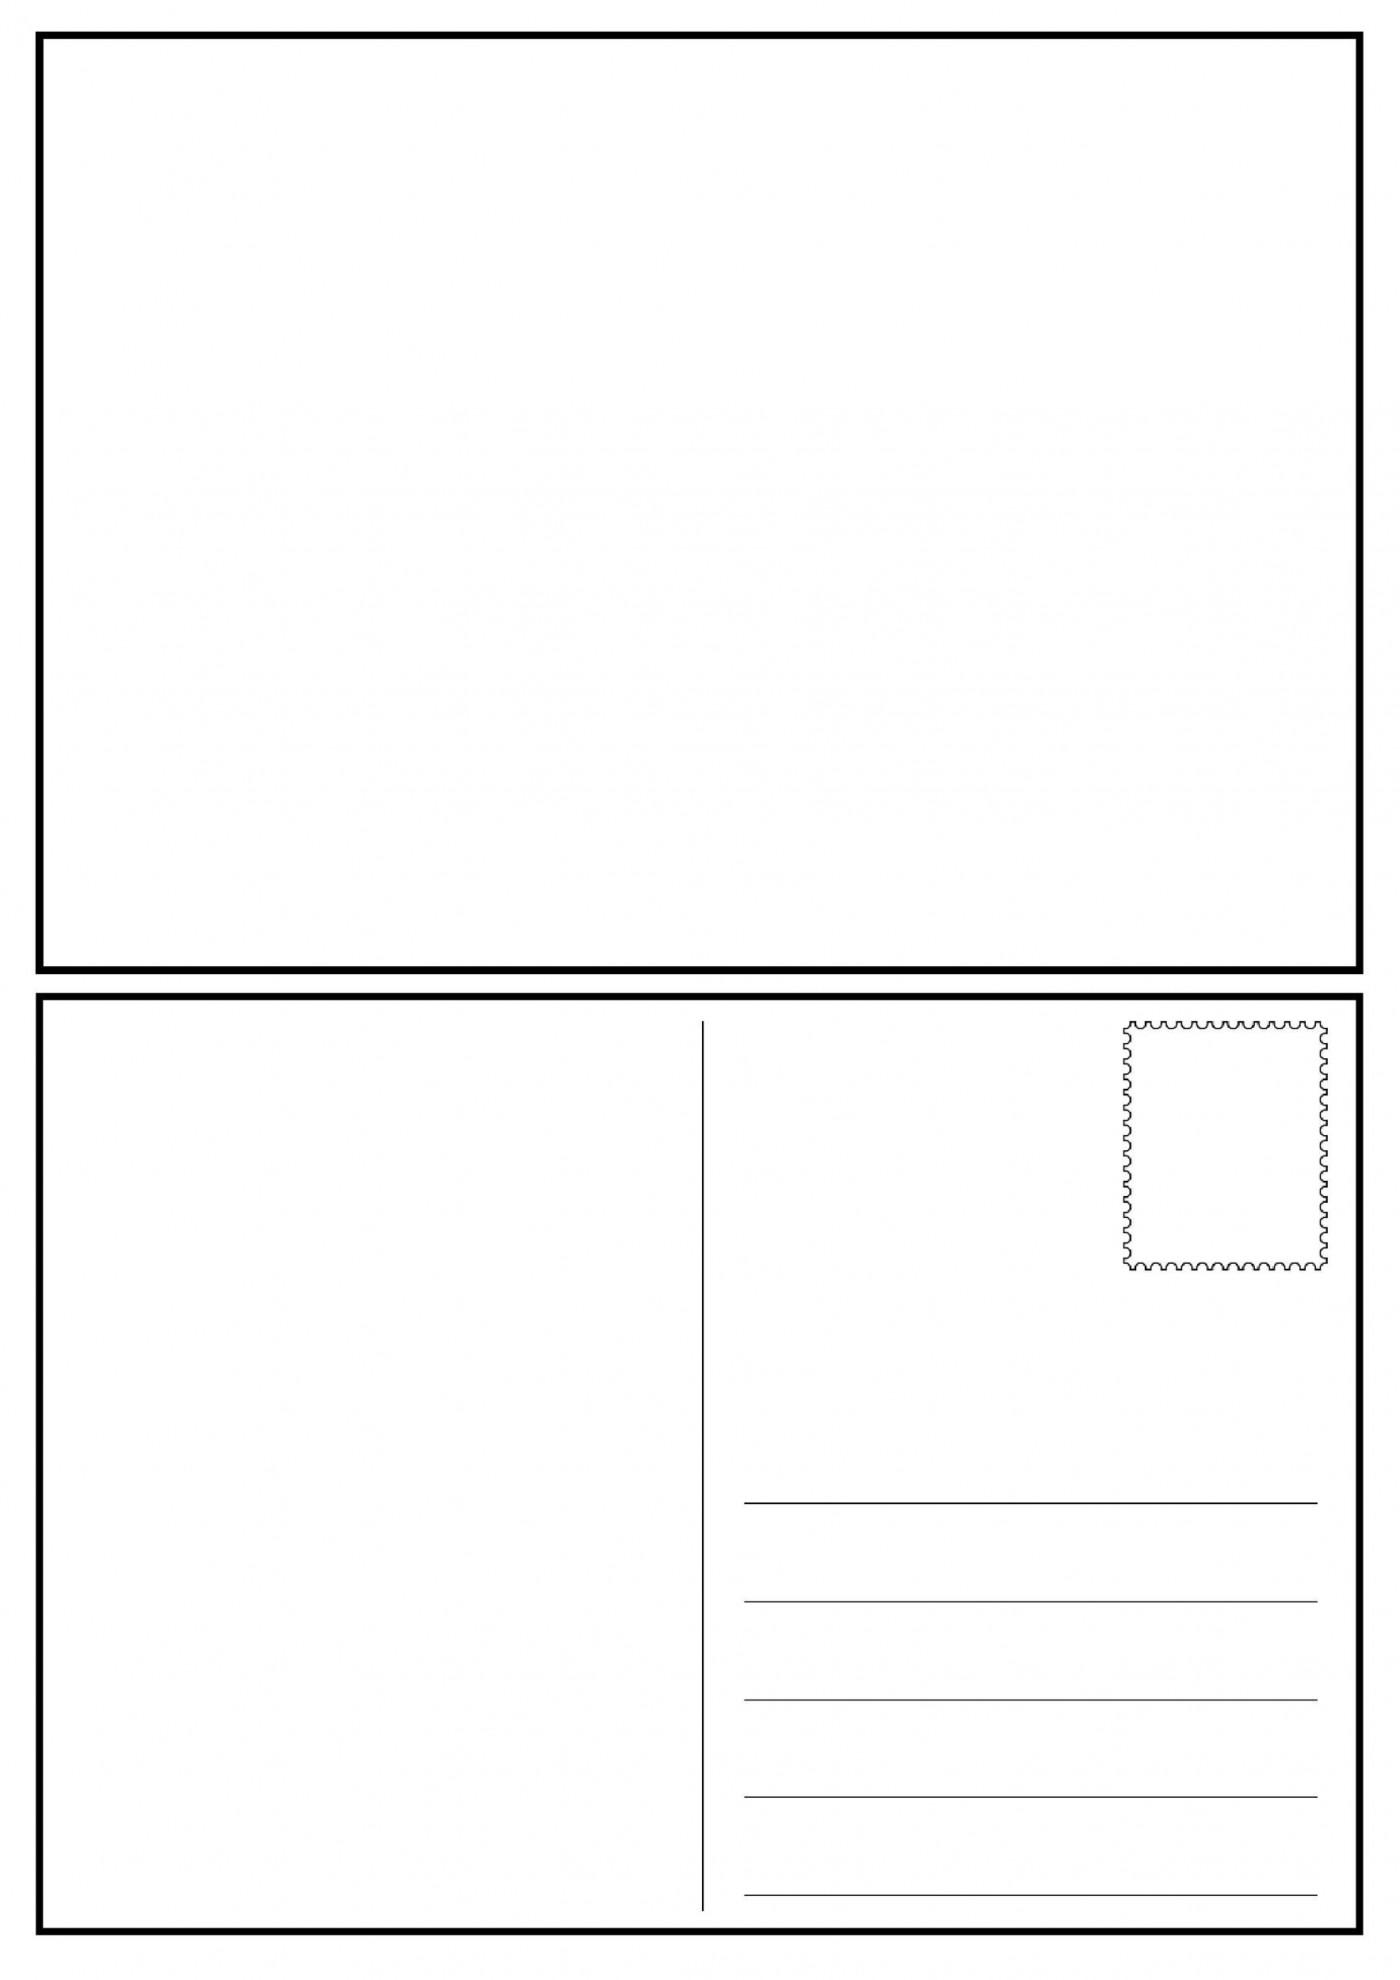 008 Impressive Postcard Layout For Microsoft Word Idea  Busines Template1400